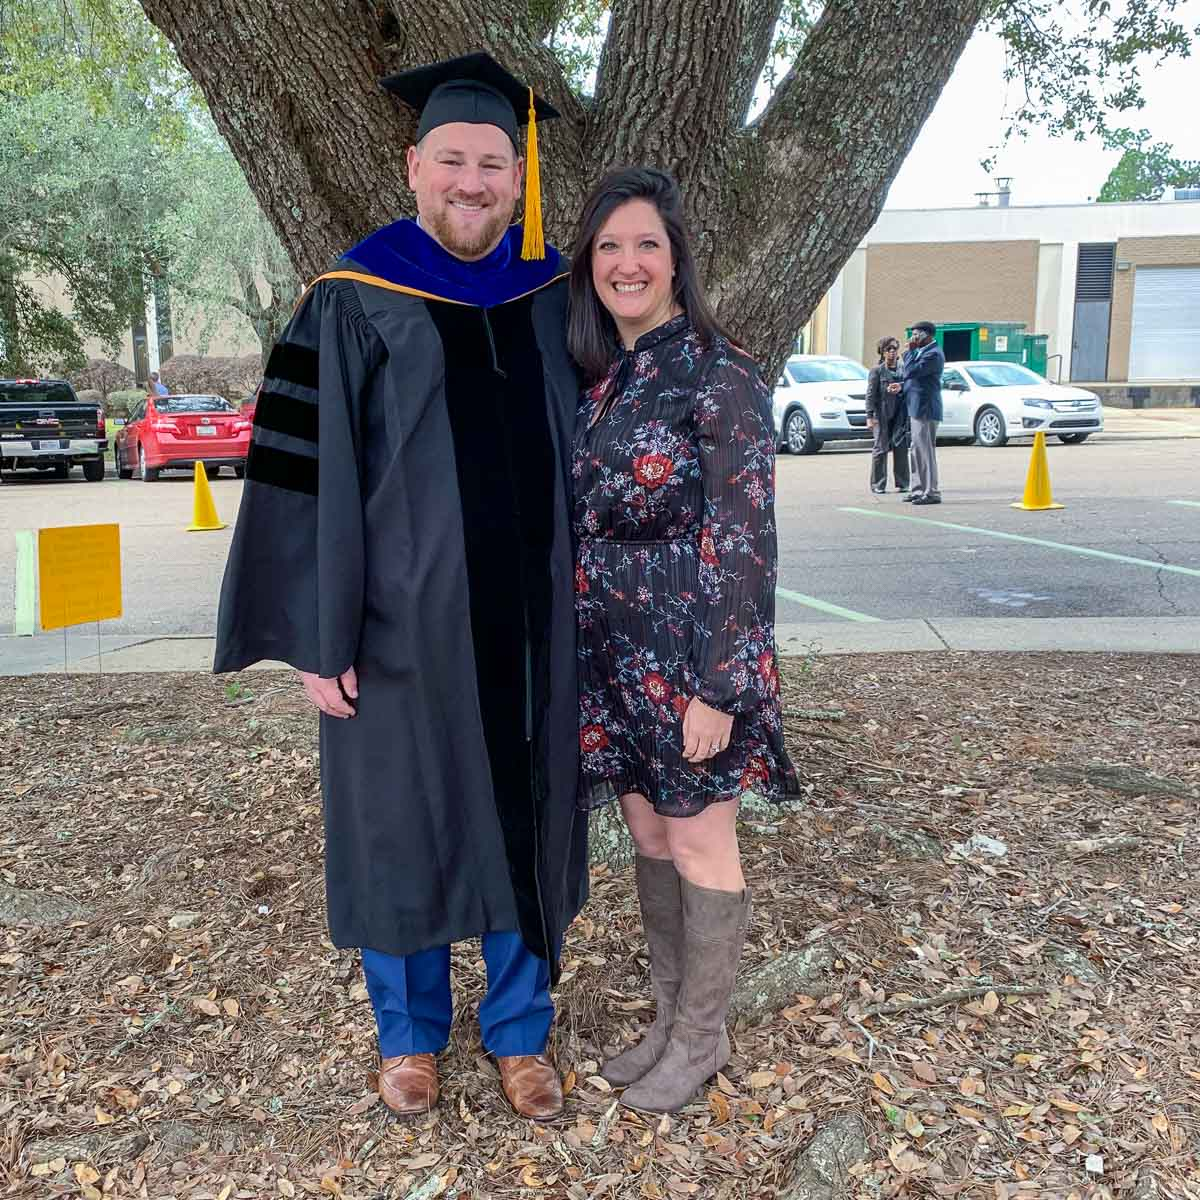 Colin Colbourn's Ph.D. Graduation photo